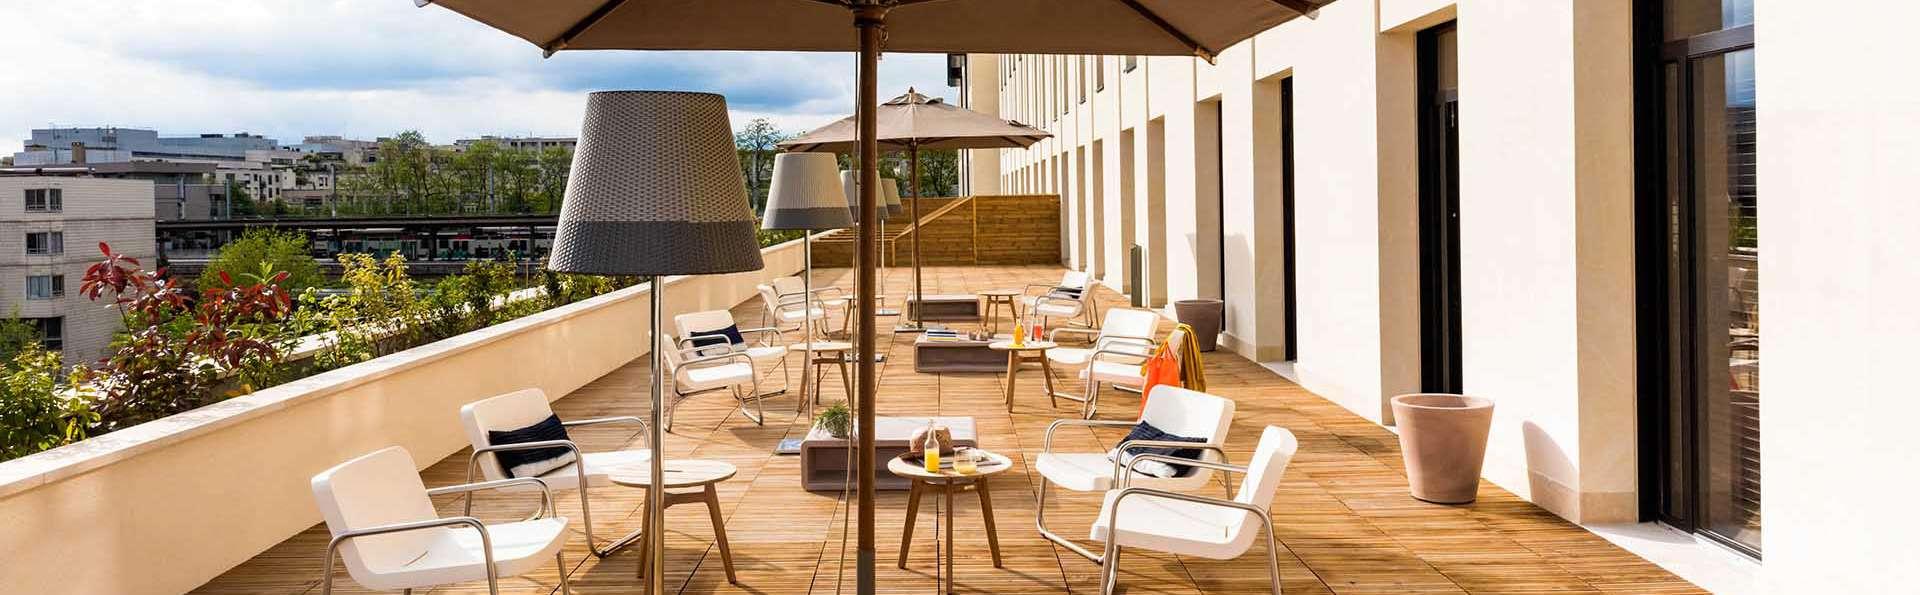 OKKO HOTELS Paris Rueil Malmaison - EDIT_MD_OKKO_HOTELS_RUEIL_01.jpg